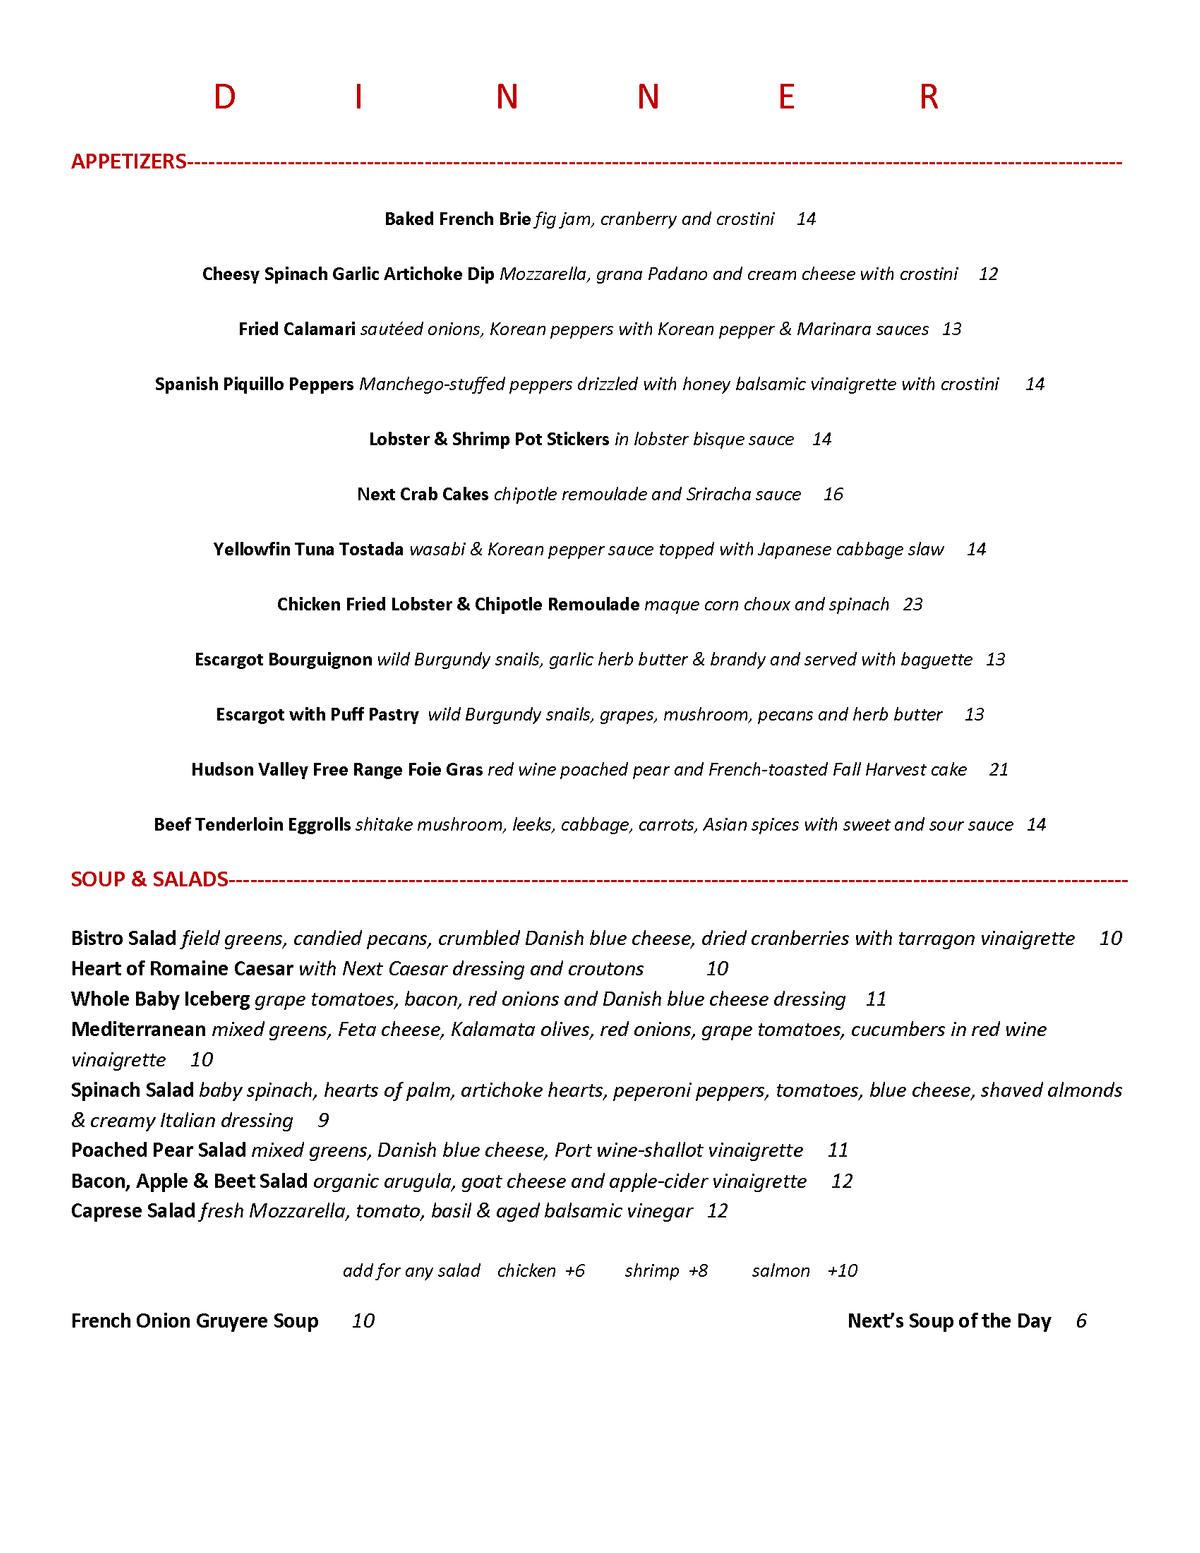 Dinner Menu October 16, 2019_Page_1.png